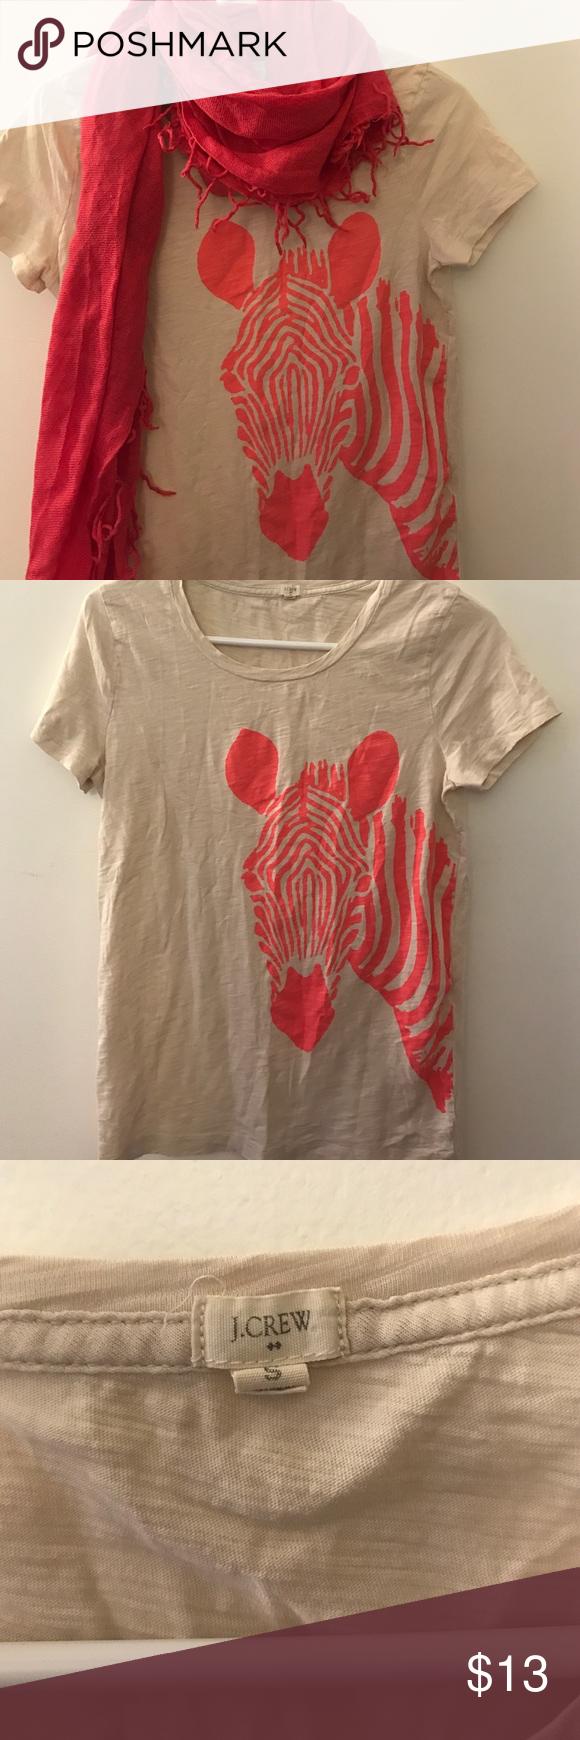 J Crew orange zebra t shirt J Crew beige t shirt with orange zebra design. Tops Tees - Short Sleeve